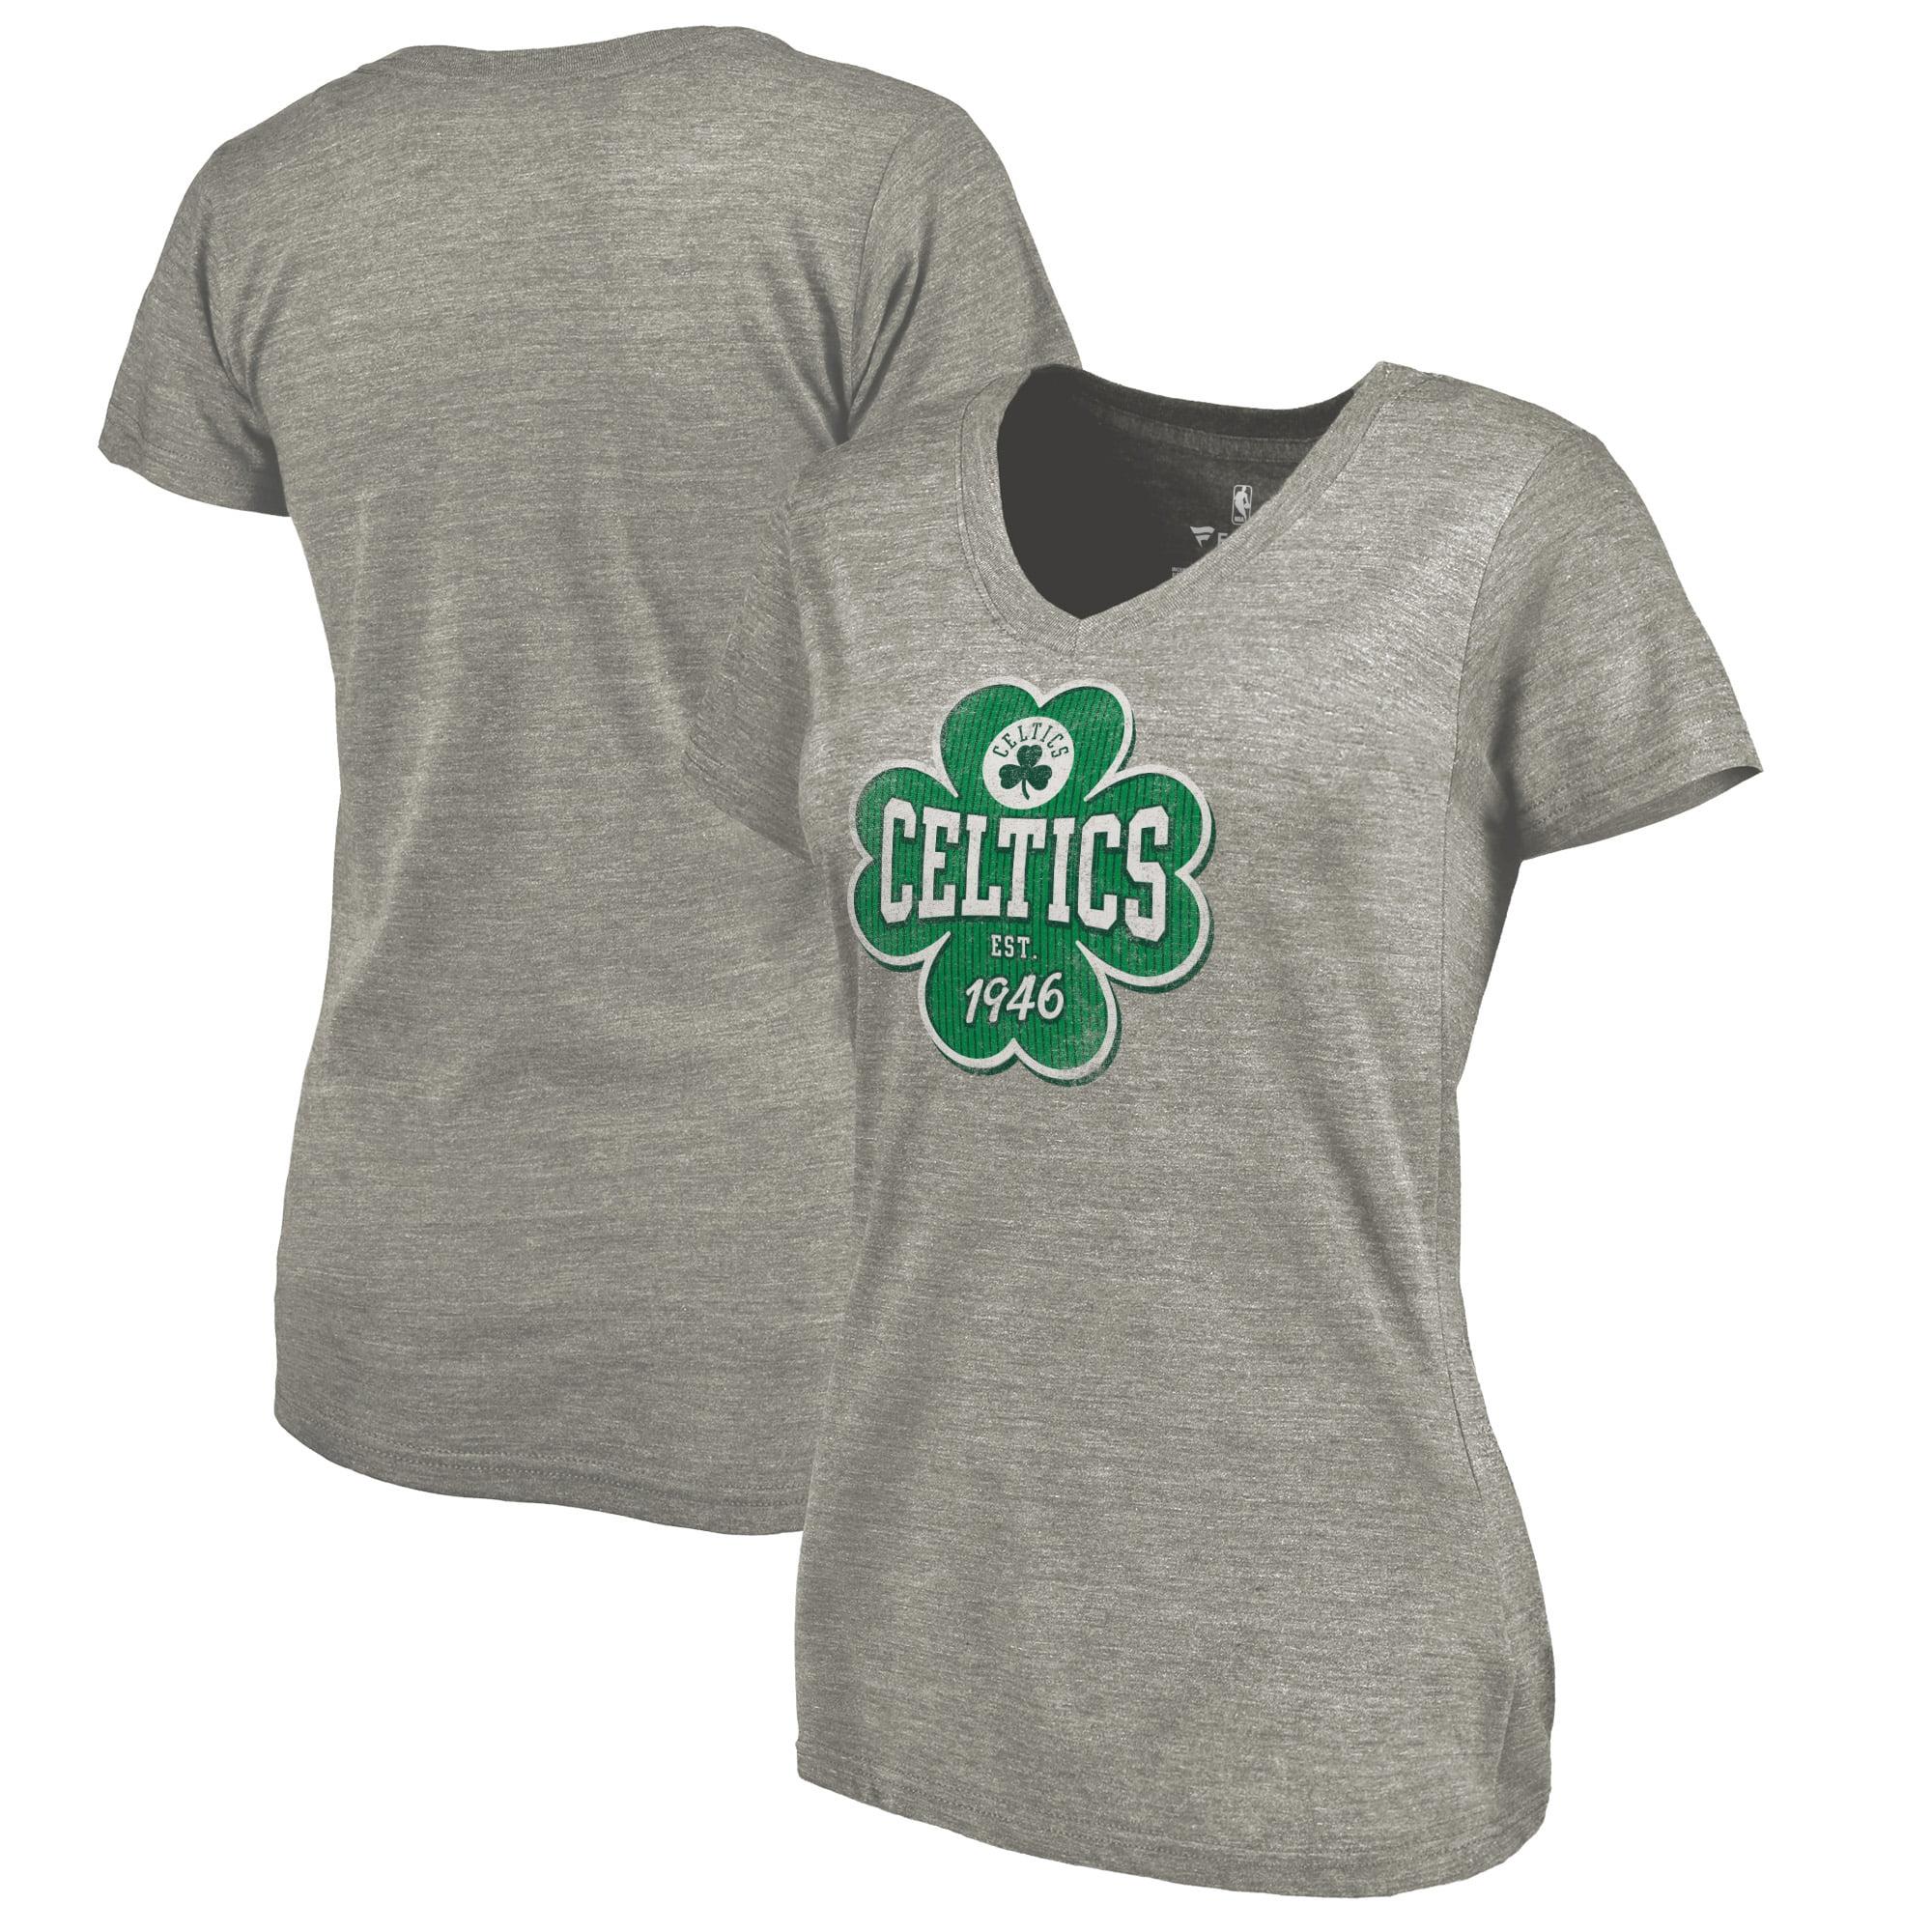 Boston Celtics Fanatics Branded Women's St. Patrick's Day Emerald Isle V-Neck Tri-Blend T-Shirt - Heathered Gray